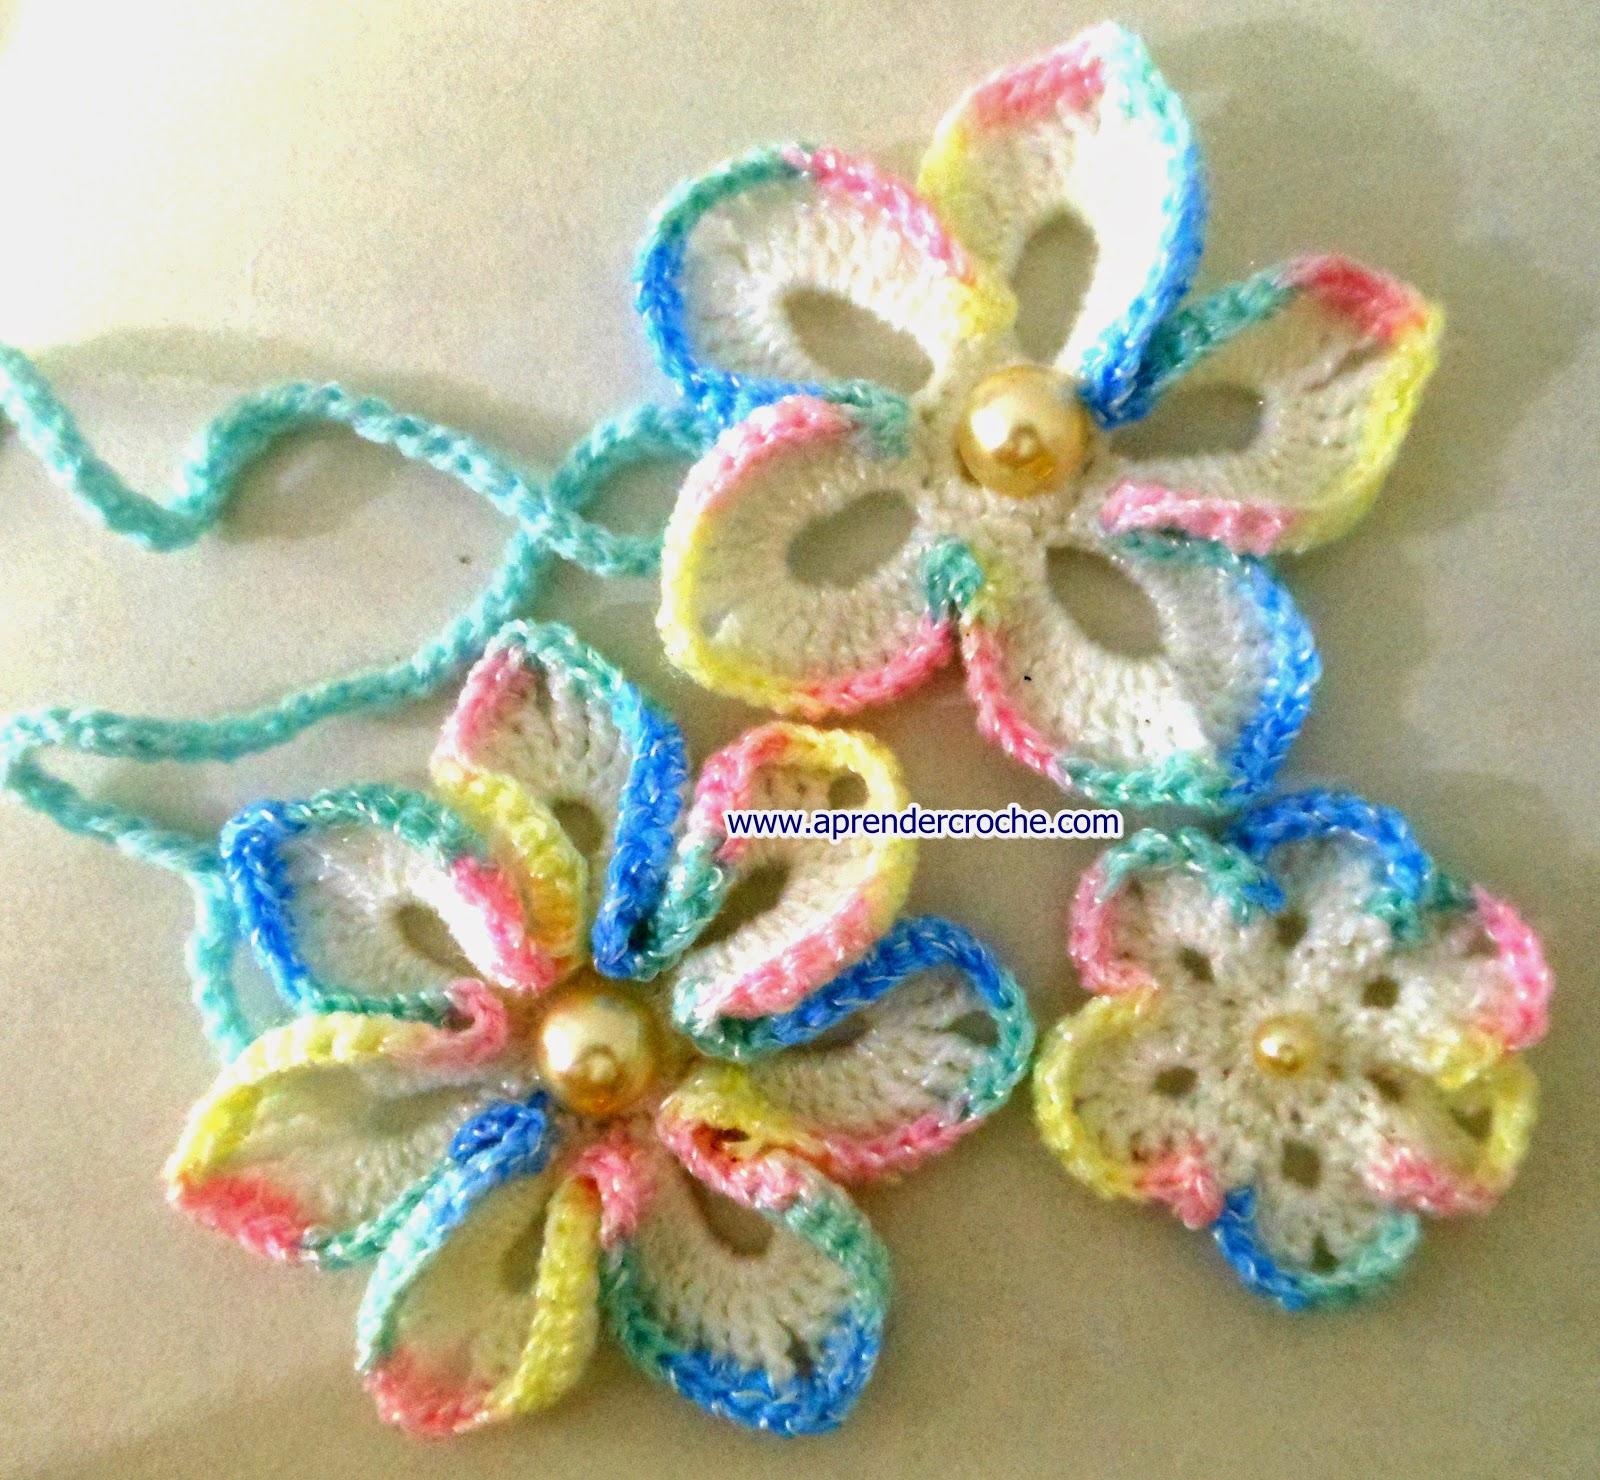 aprender croche flores inverno baby inverno pantufas dvd video-aulas gratis loja curso de croche frete gratis